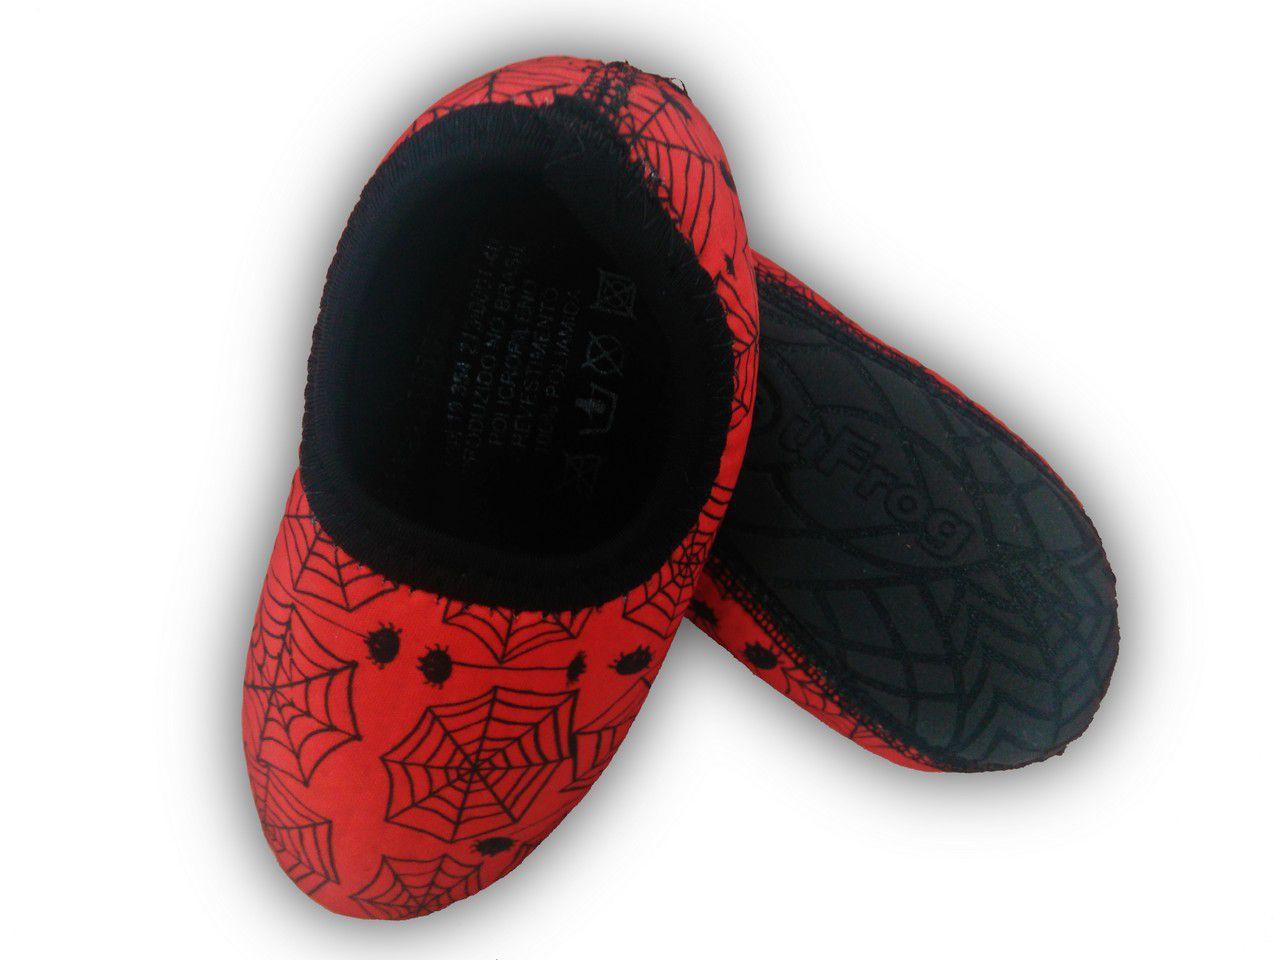 Sapato de Neoprene Fit Teia Ufrog